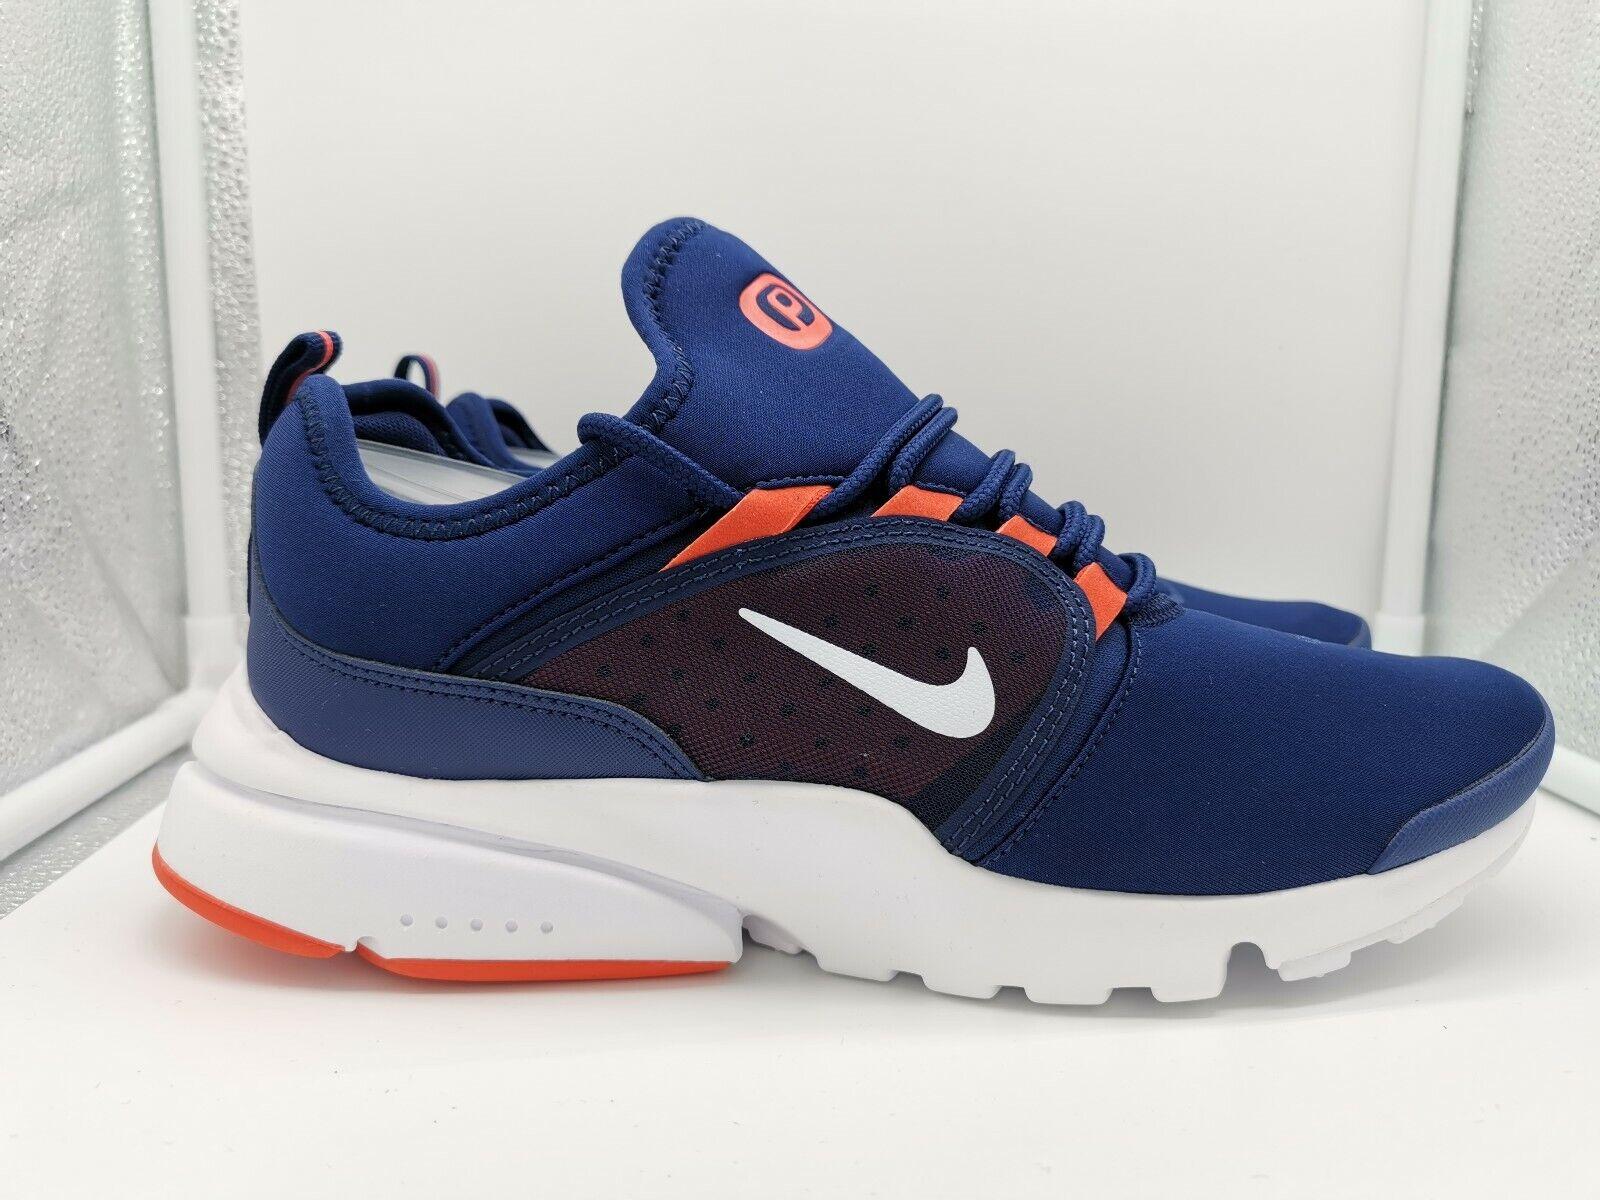 Nike Presto Fly World WRLD UK 7 Blau Void Weiß Team Orange AV7763-401